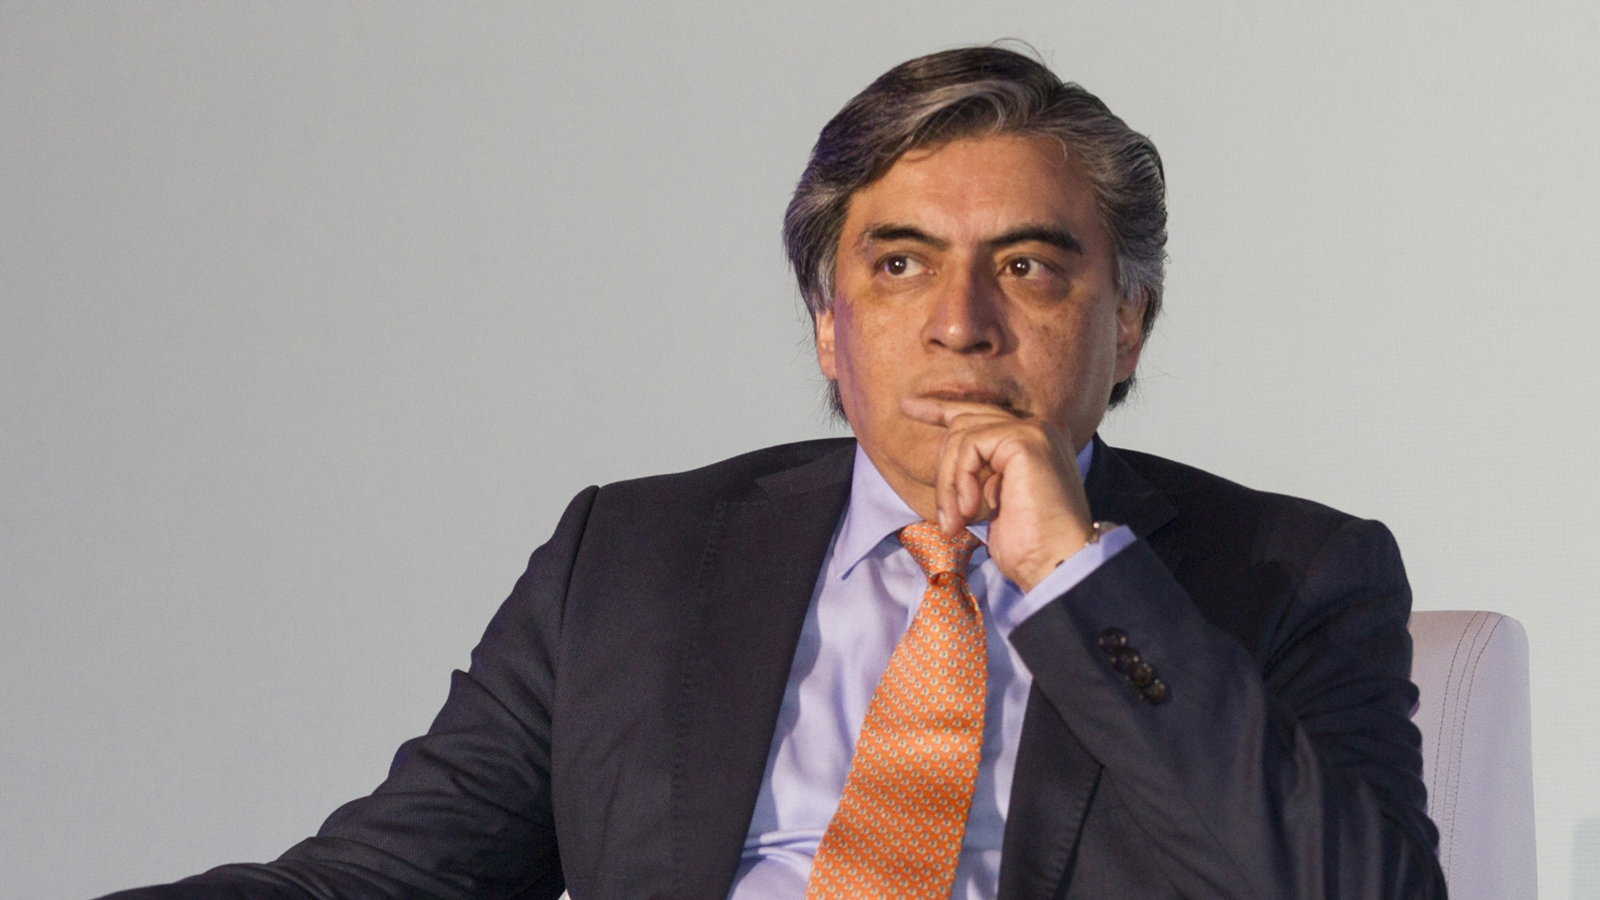 Minuta de Banxico deja ver polémica interna por comunicado 'en tono restrictivo'